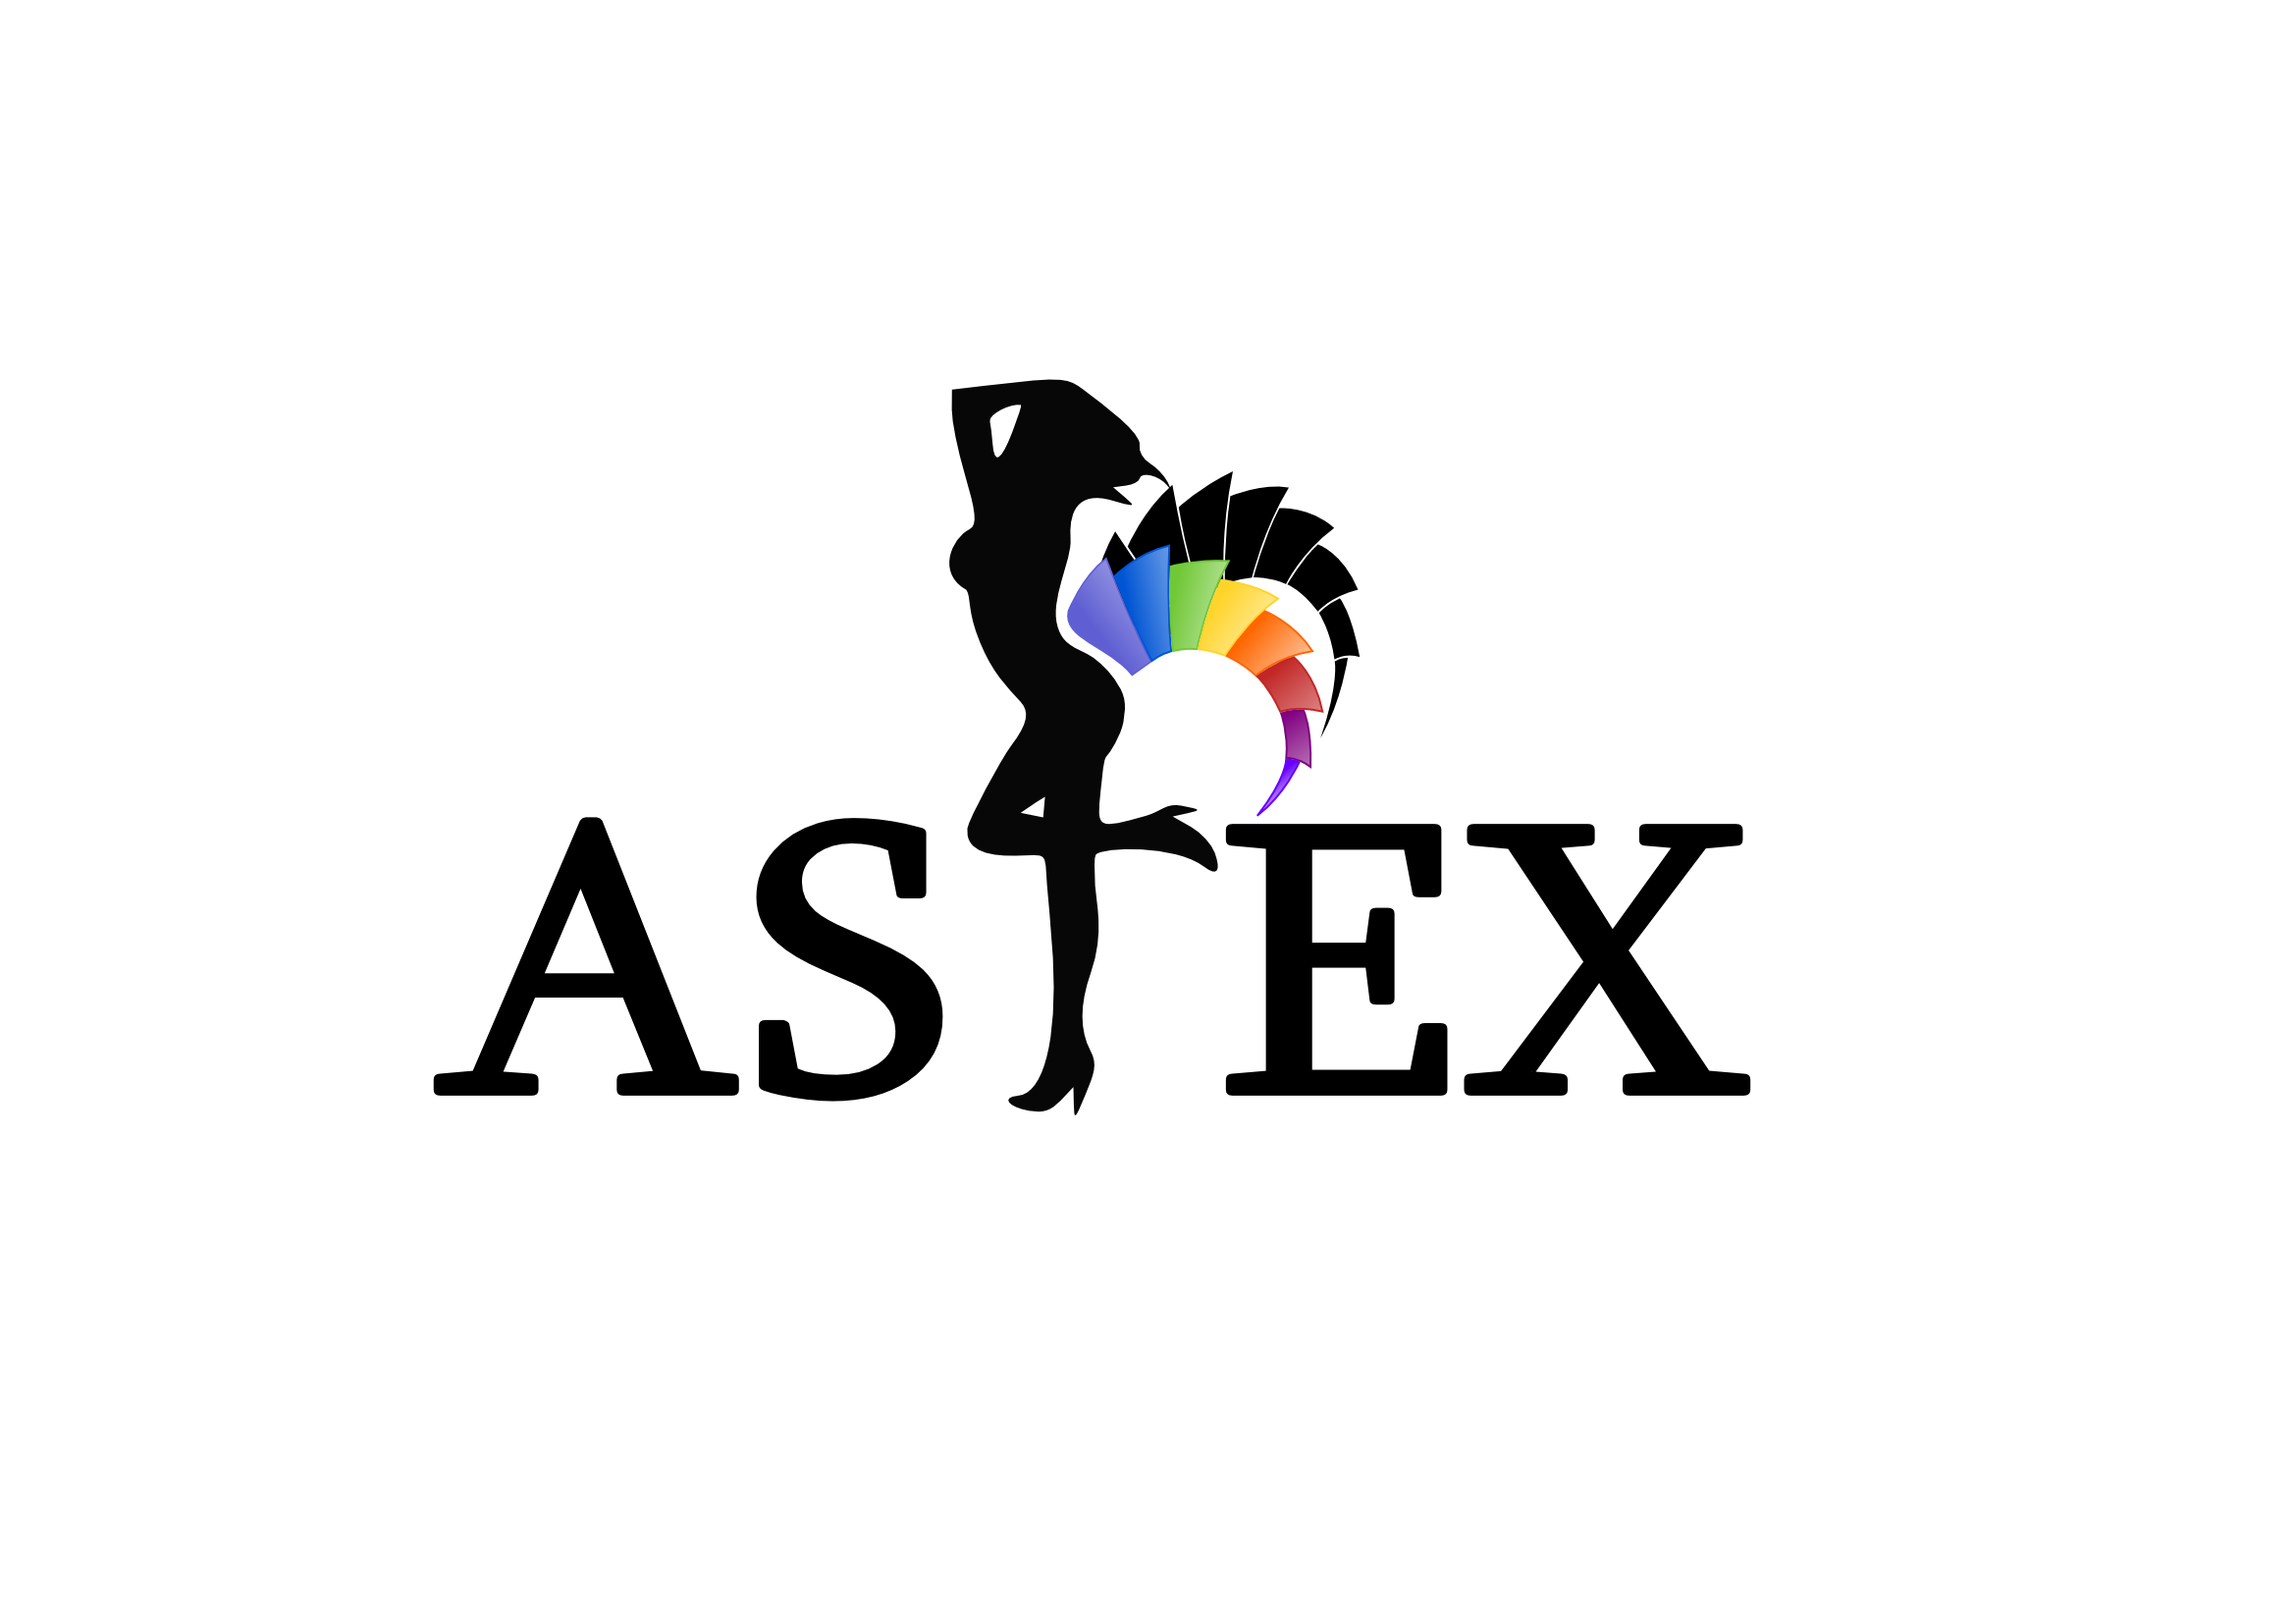 astex02-4